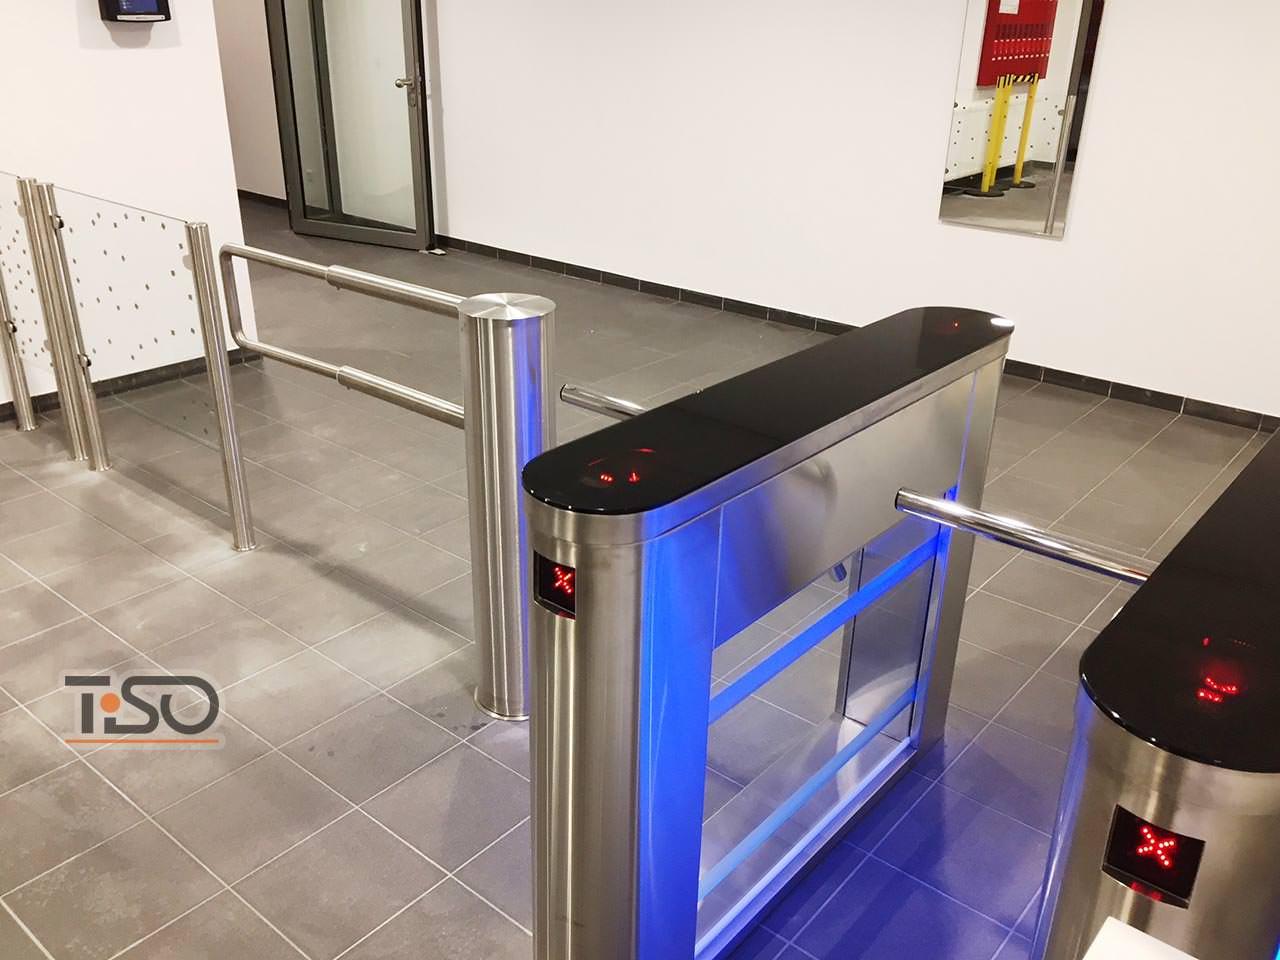 Galaxy ، Gate-TTS والهيكل الزجاجي الثابت ، مكتب DHL ، فلورستادت ، ألمانيا